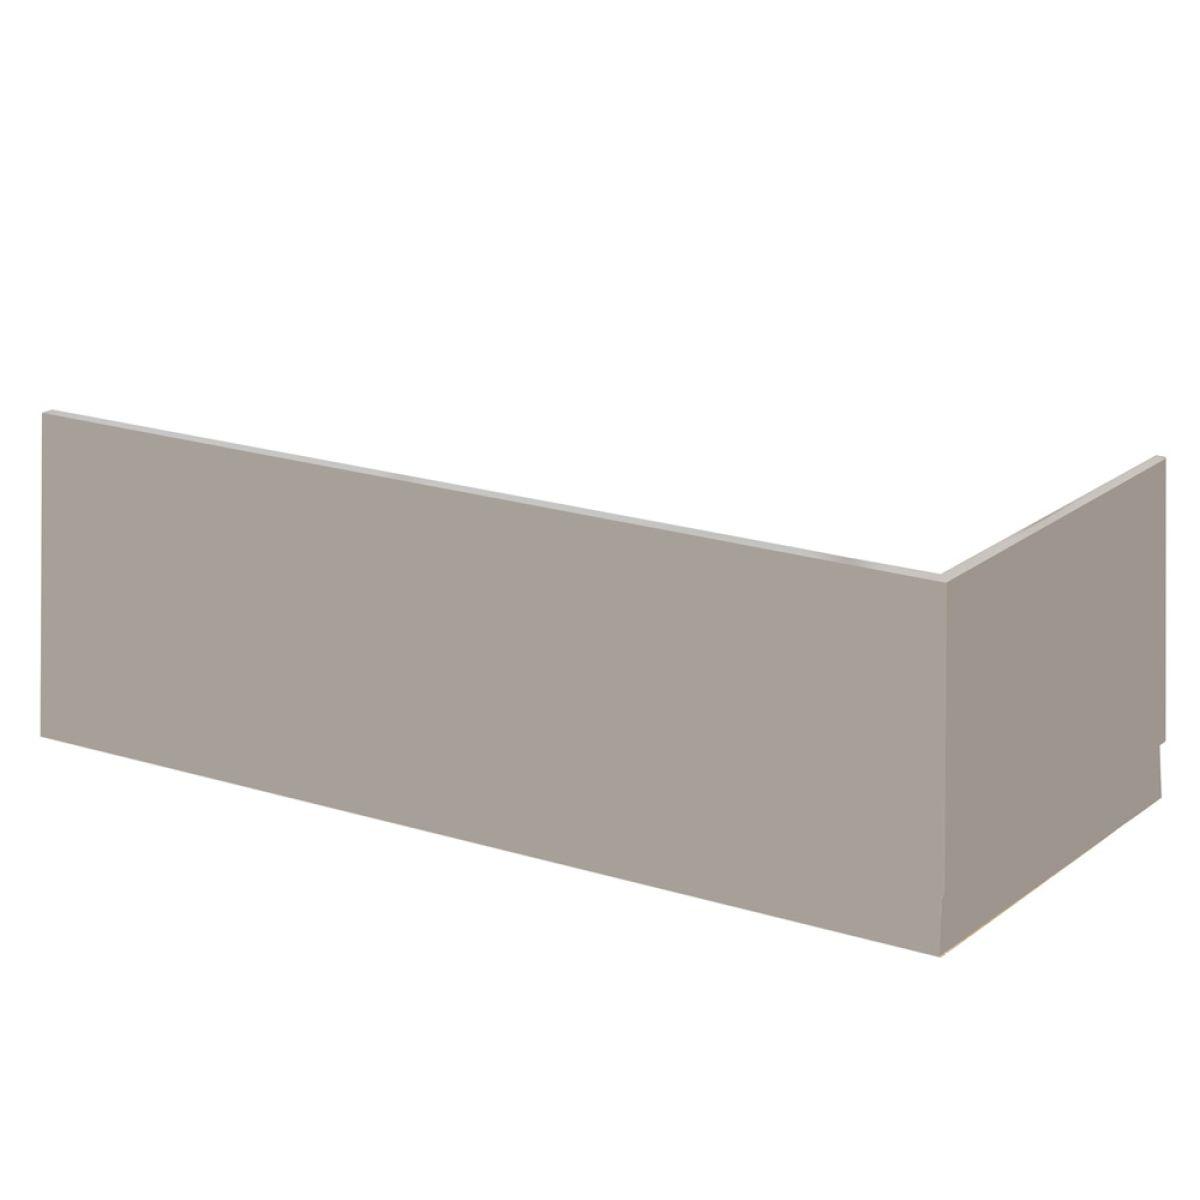 Premier Athena Stone Grey End Panel 700mm